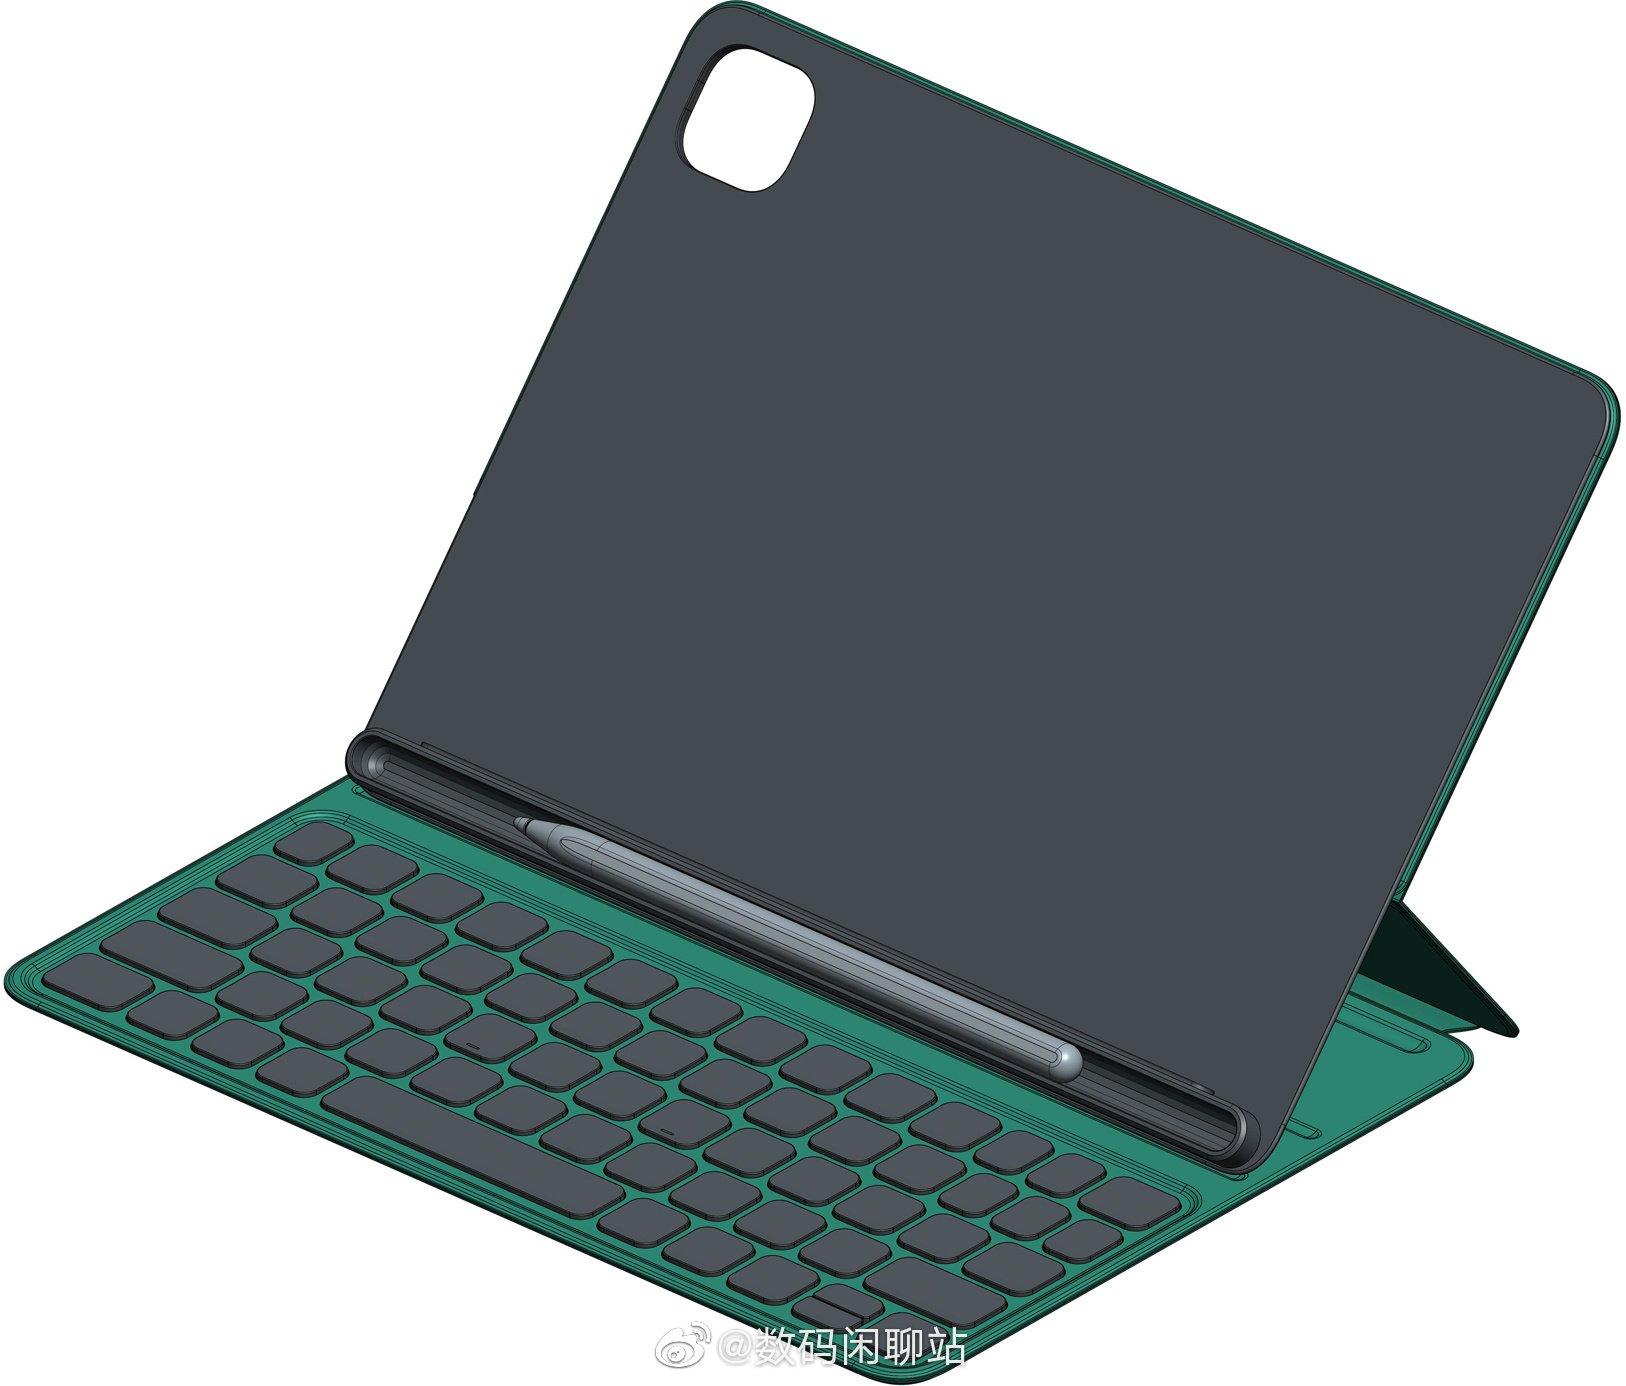 Xiaomi Tablet Accessories Patent